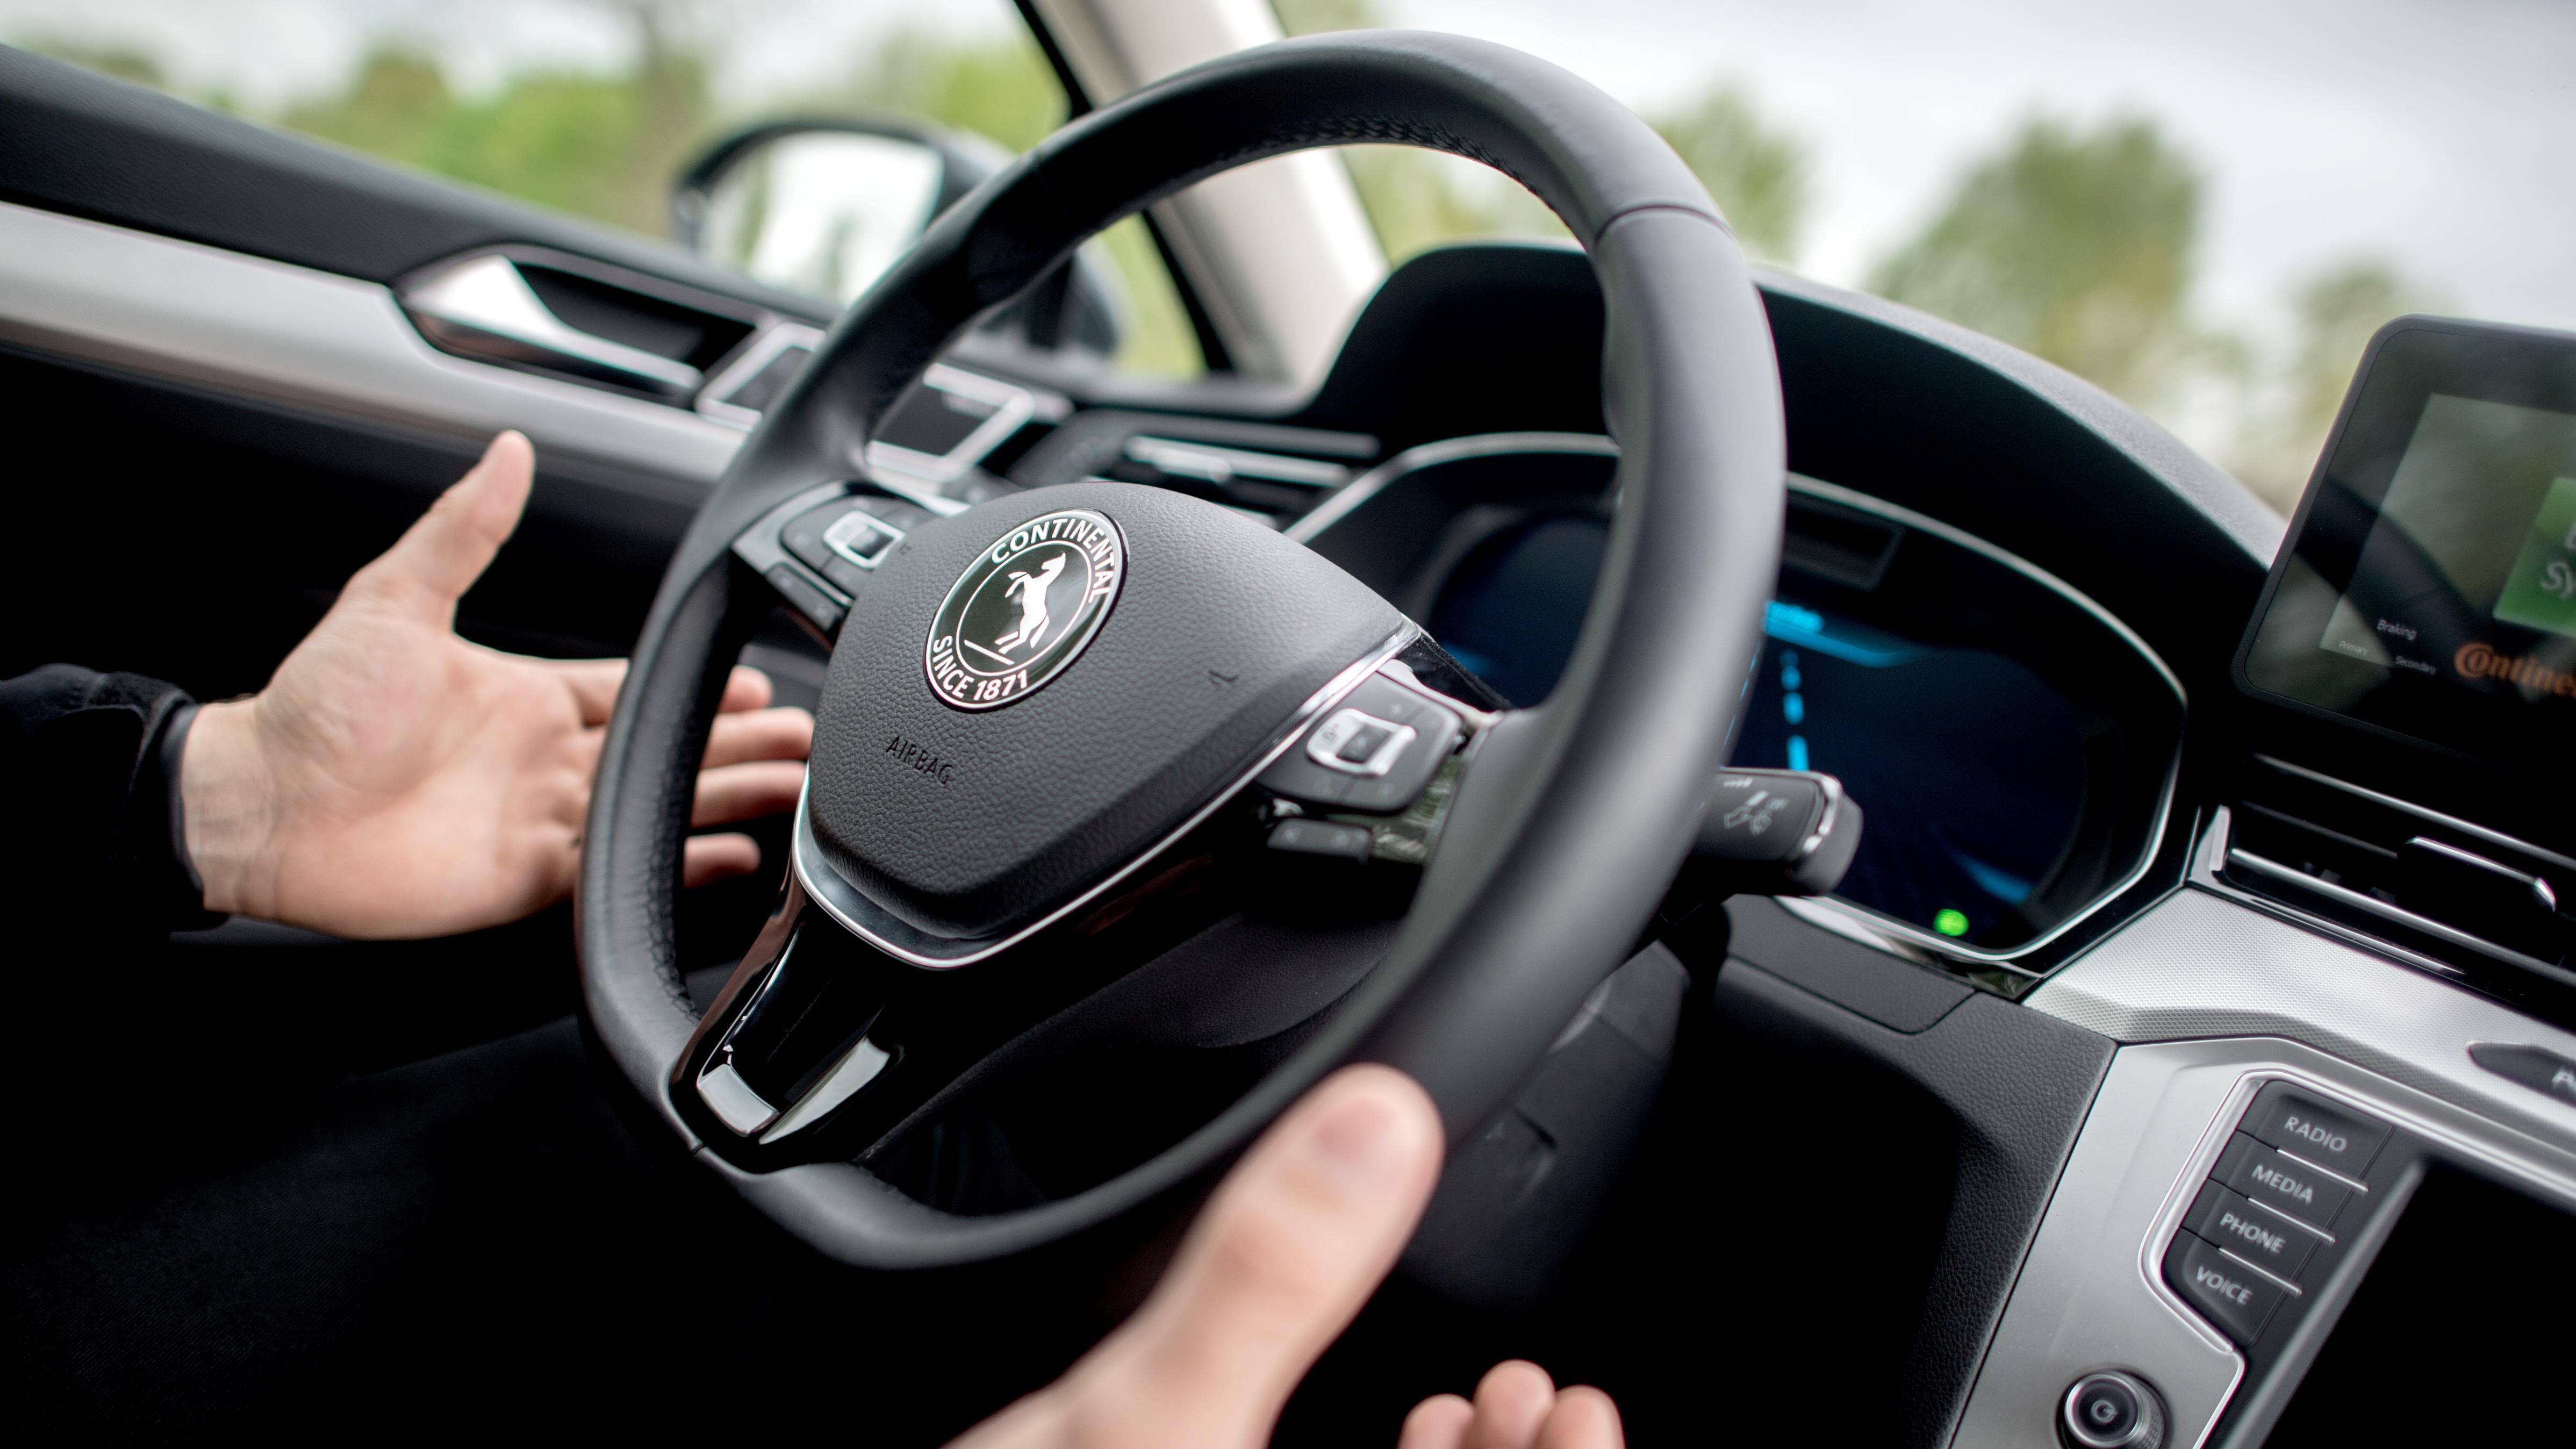 Mann in autonomem Fahrzeug nimmt Hände vom Lenkrad